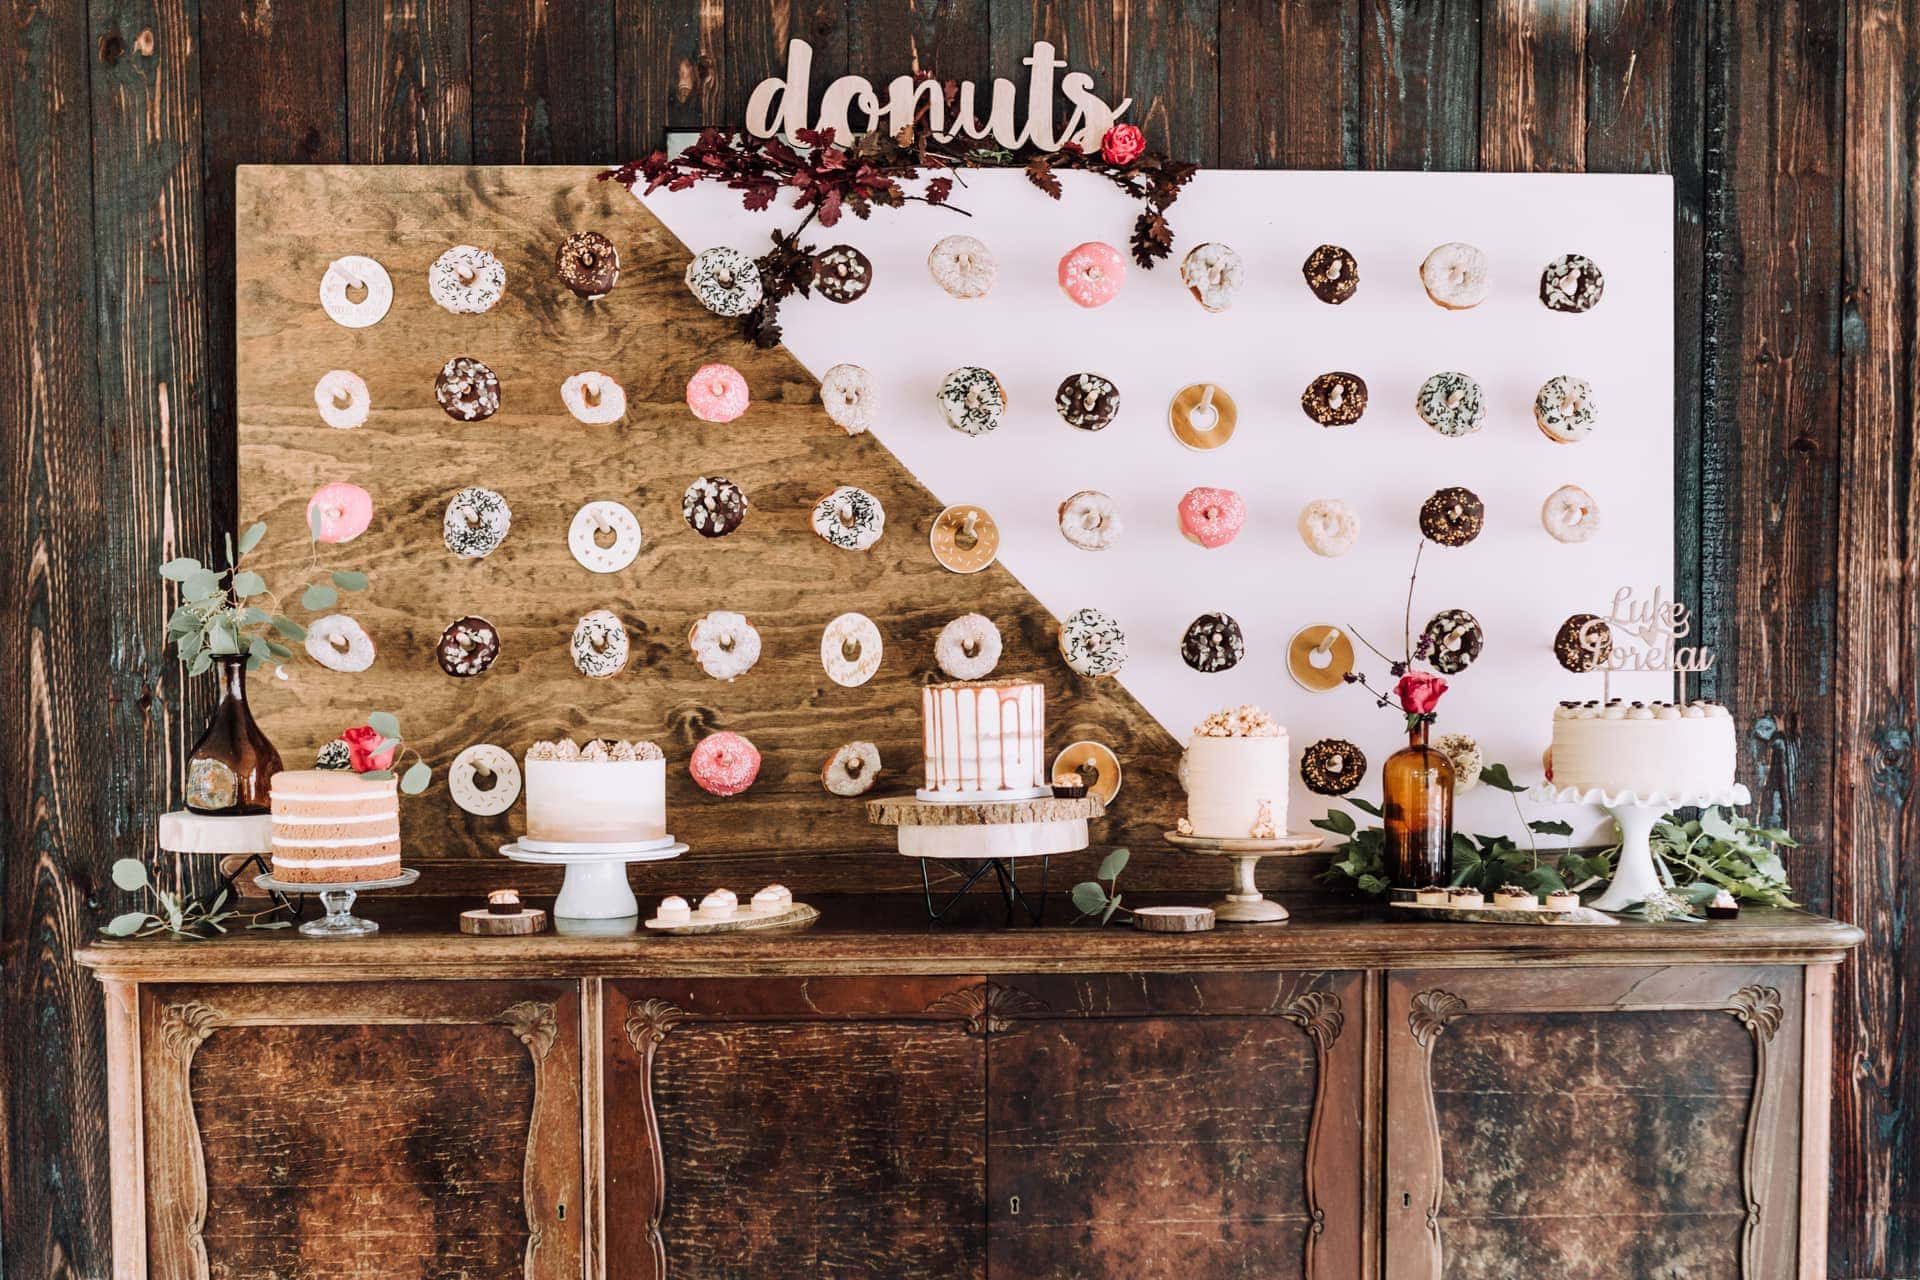 Donut wall met donuts op je bruiloft